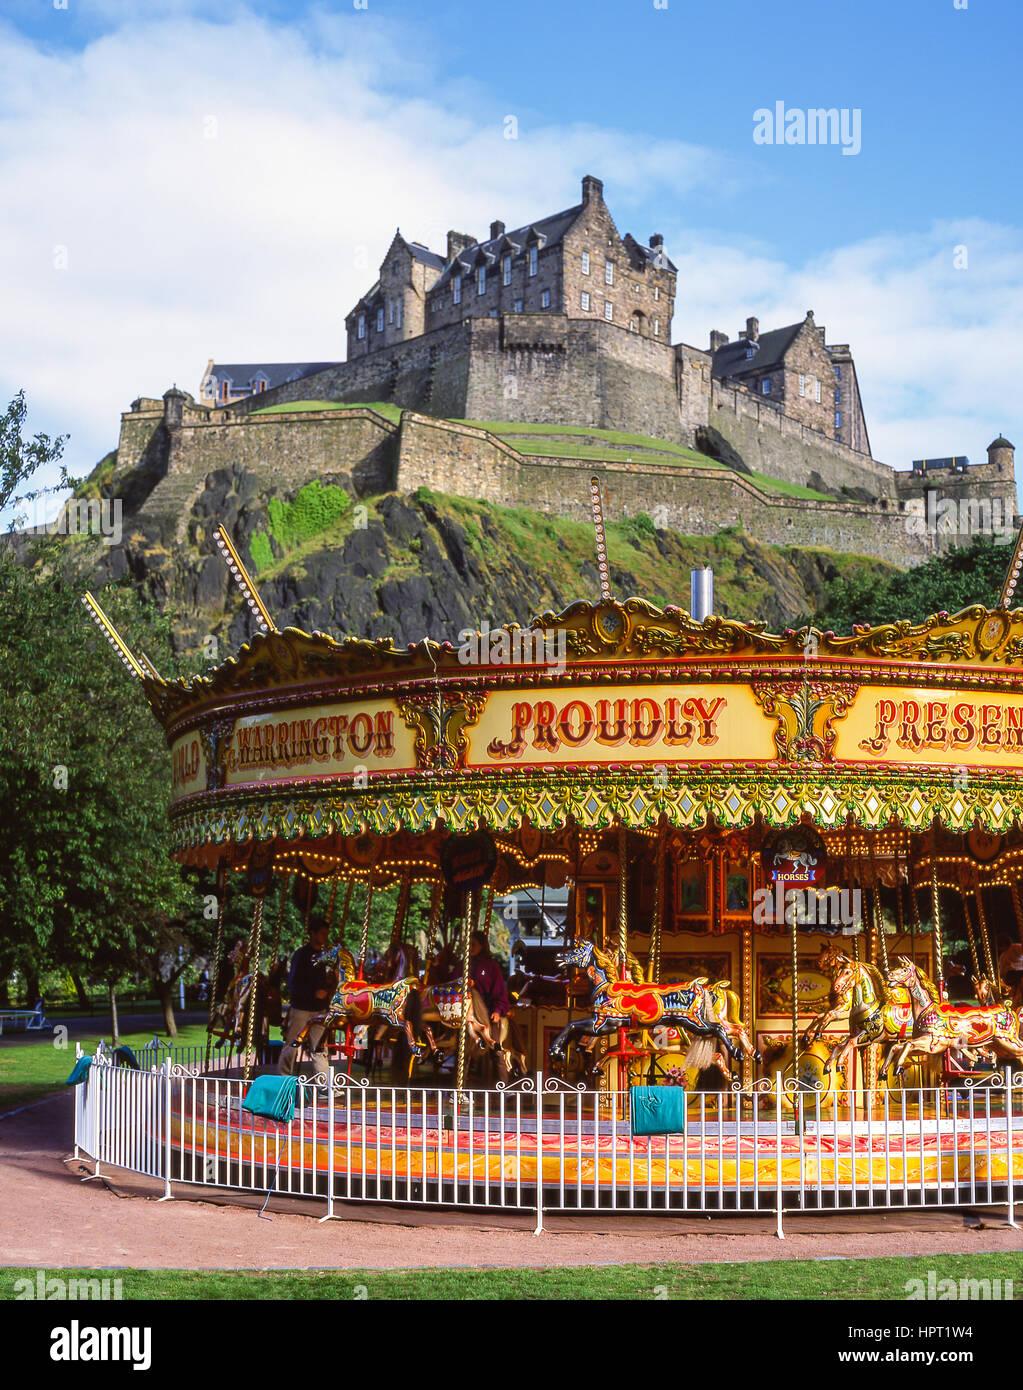 Children's carousel beneath Edinburgh Castle, Princes Street Gardens, Edinburgh, Lothian, Scotland, United Kingdom - Stock Image